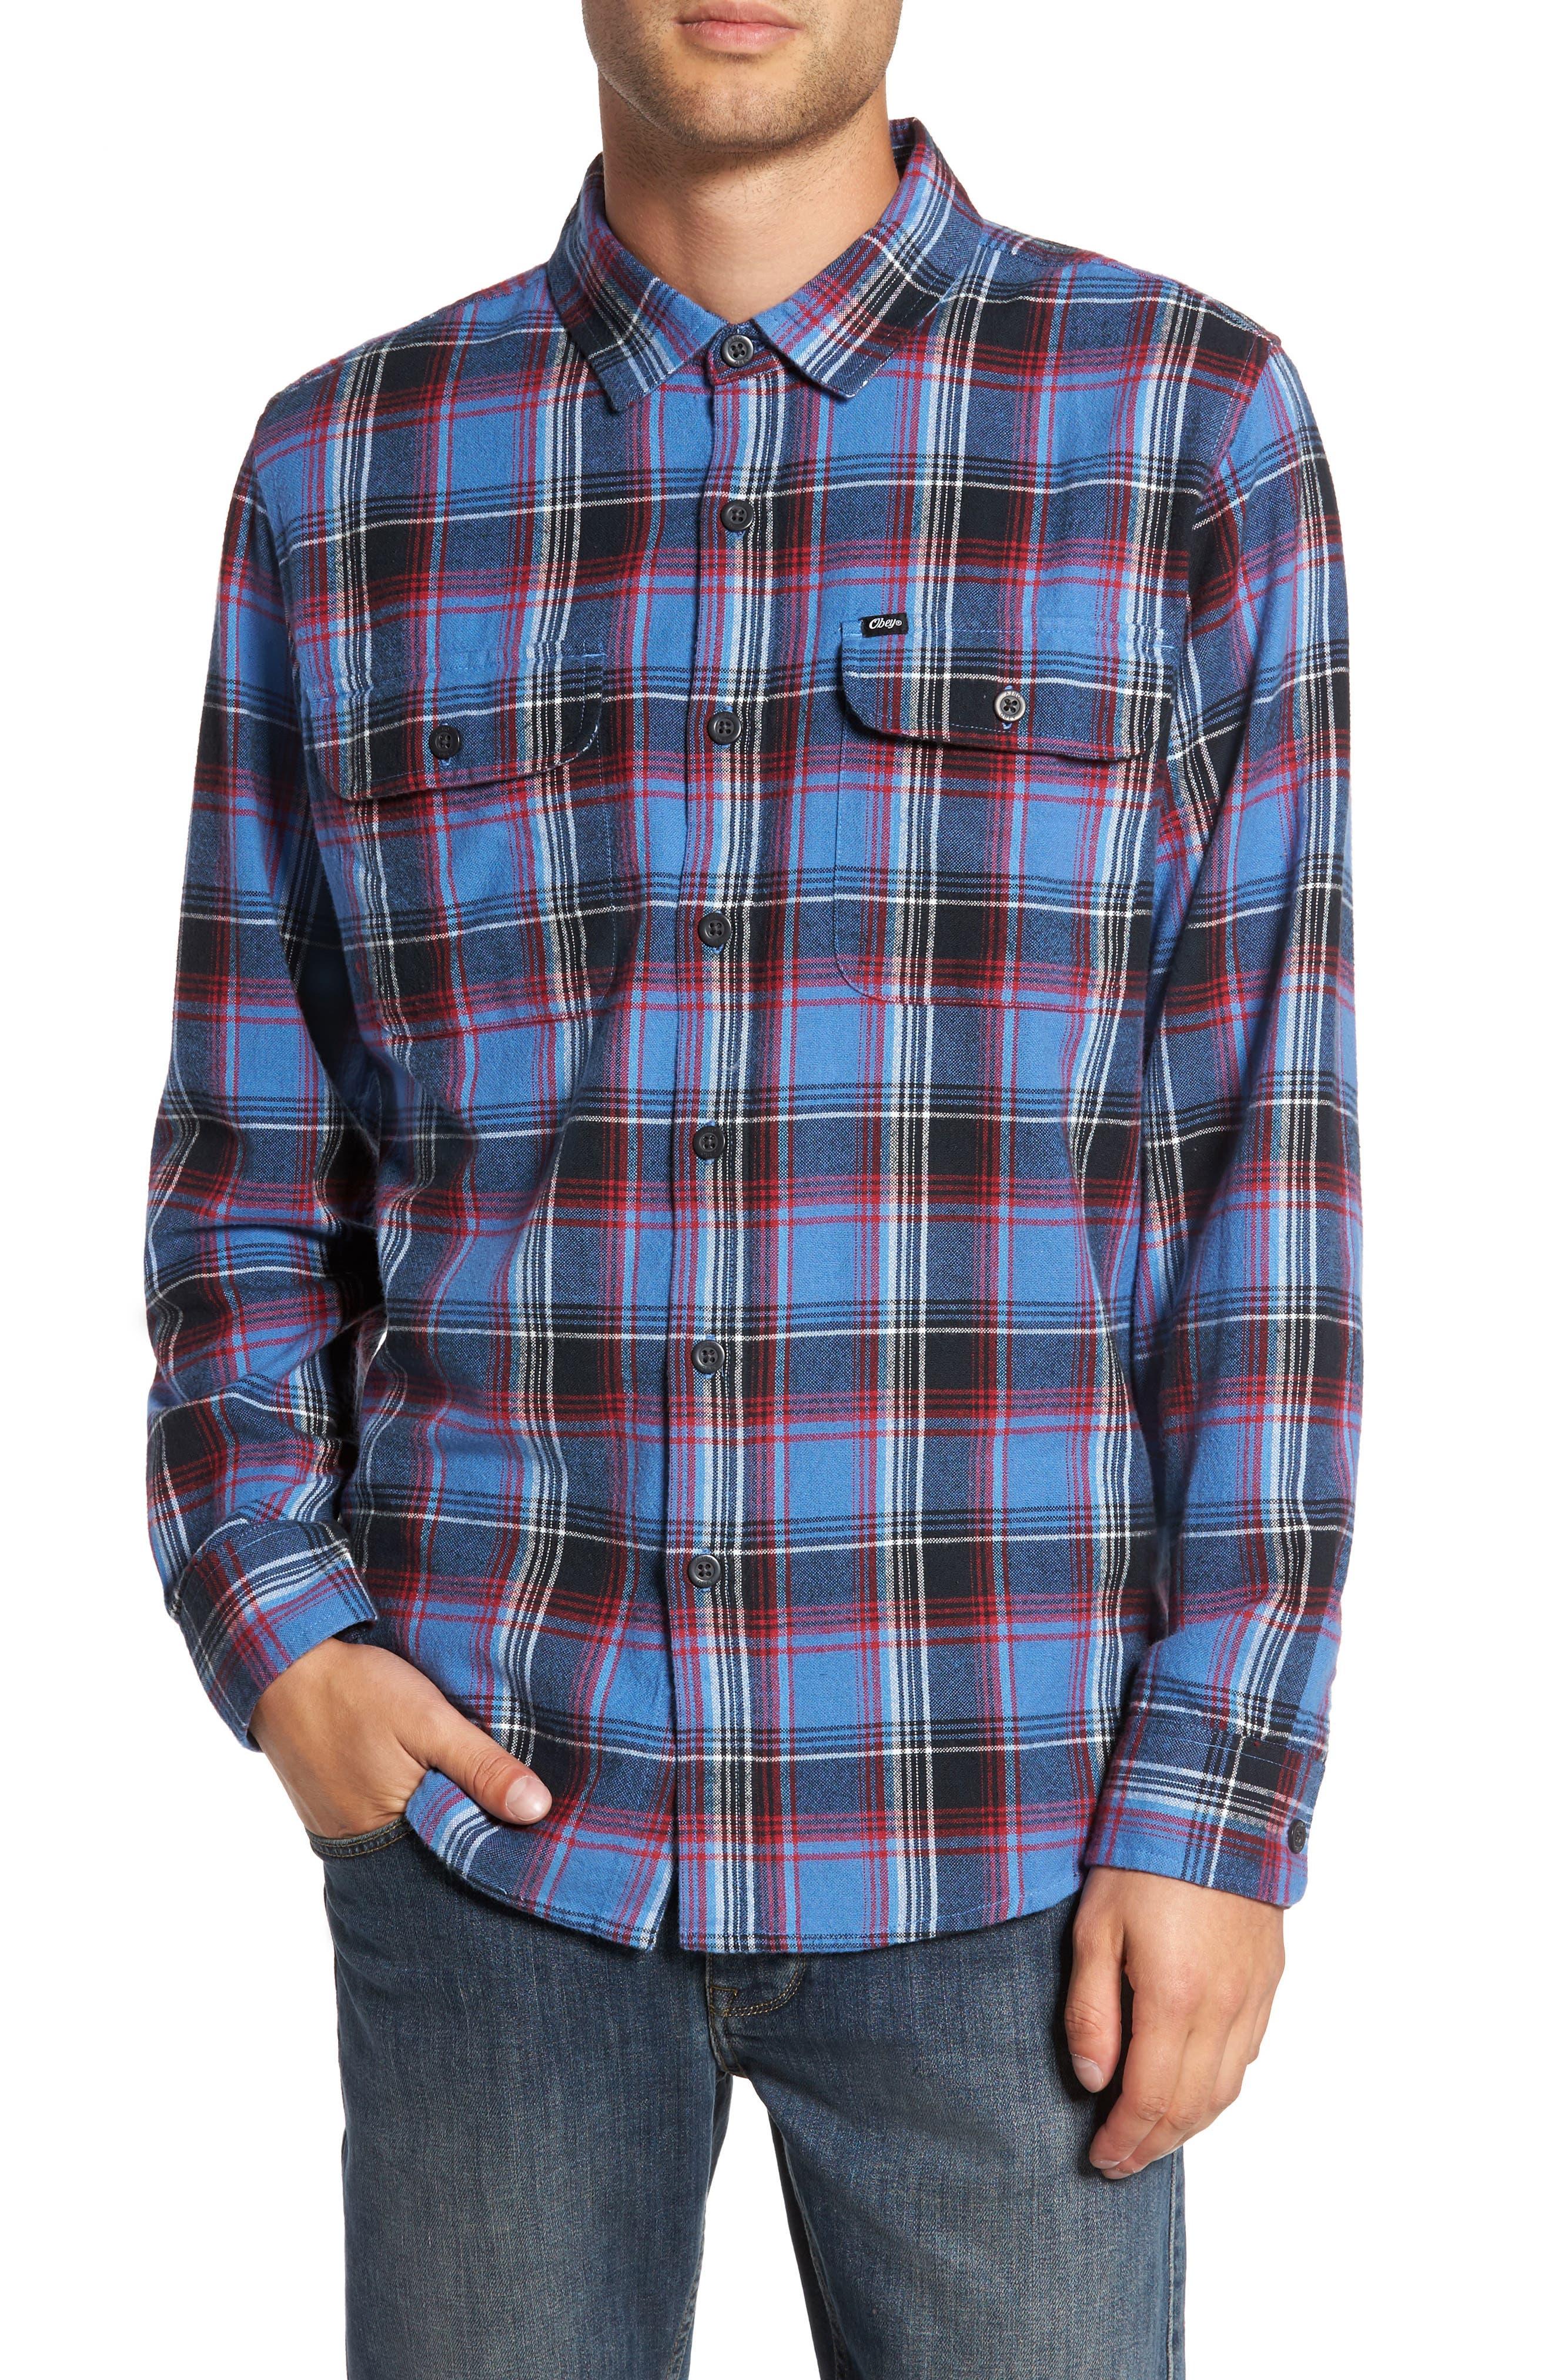 Marvyn Plaid Woven Shirt,                         Main,                         color, 410